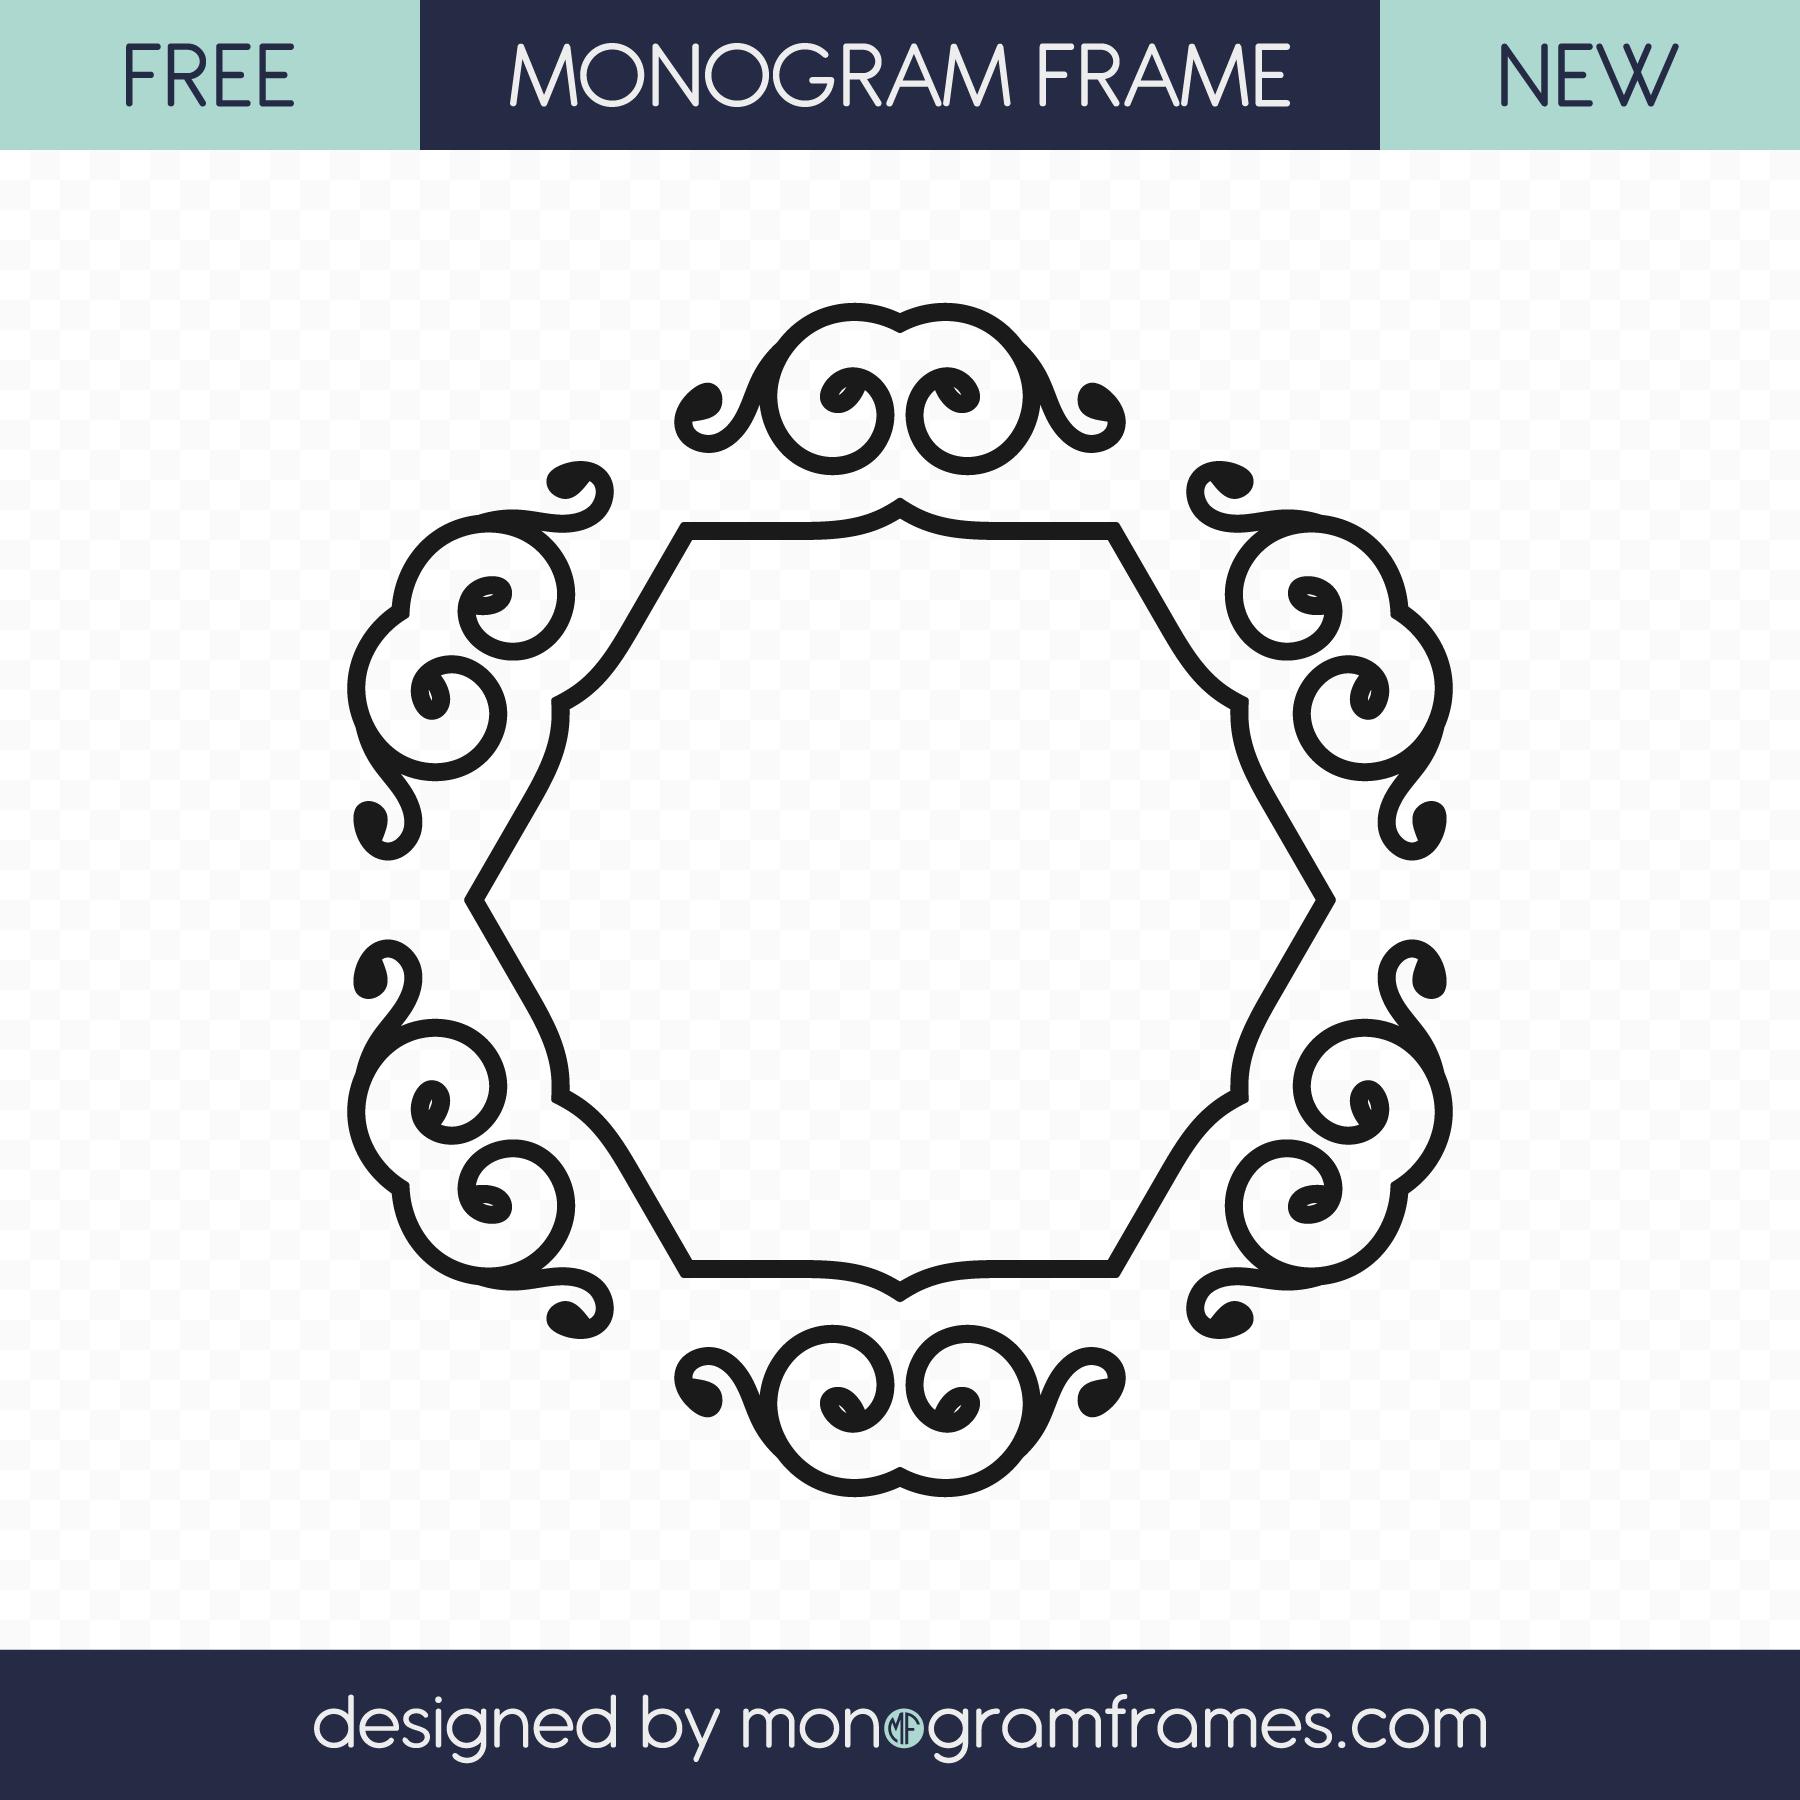 Free ornament SVG Free monogram, Monogram frame